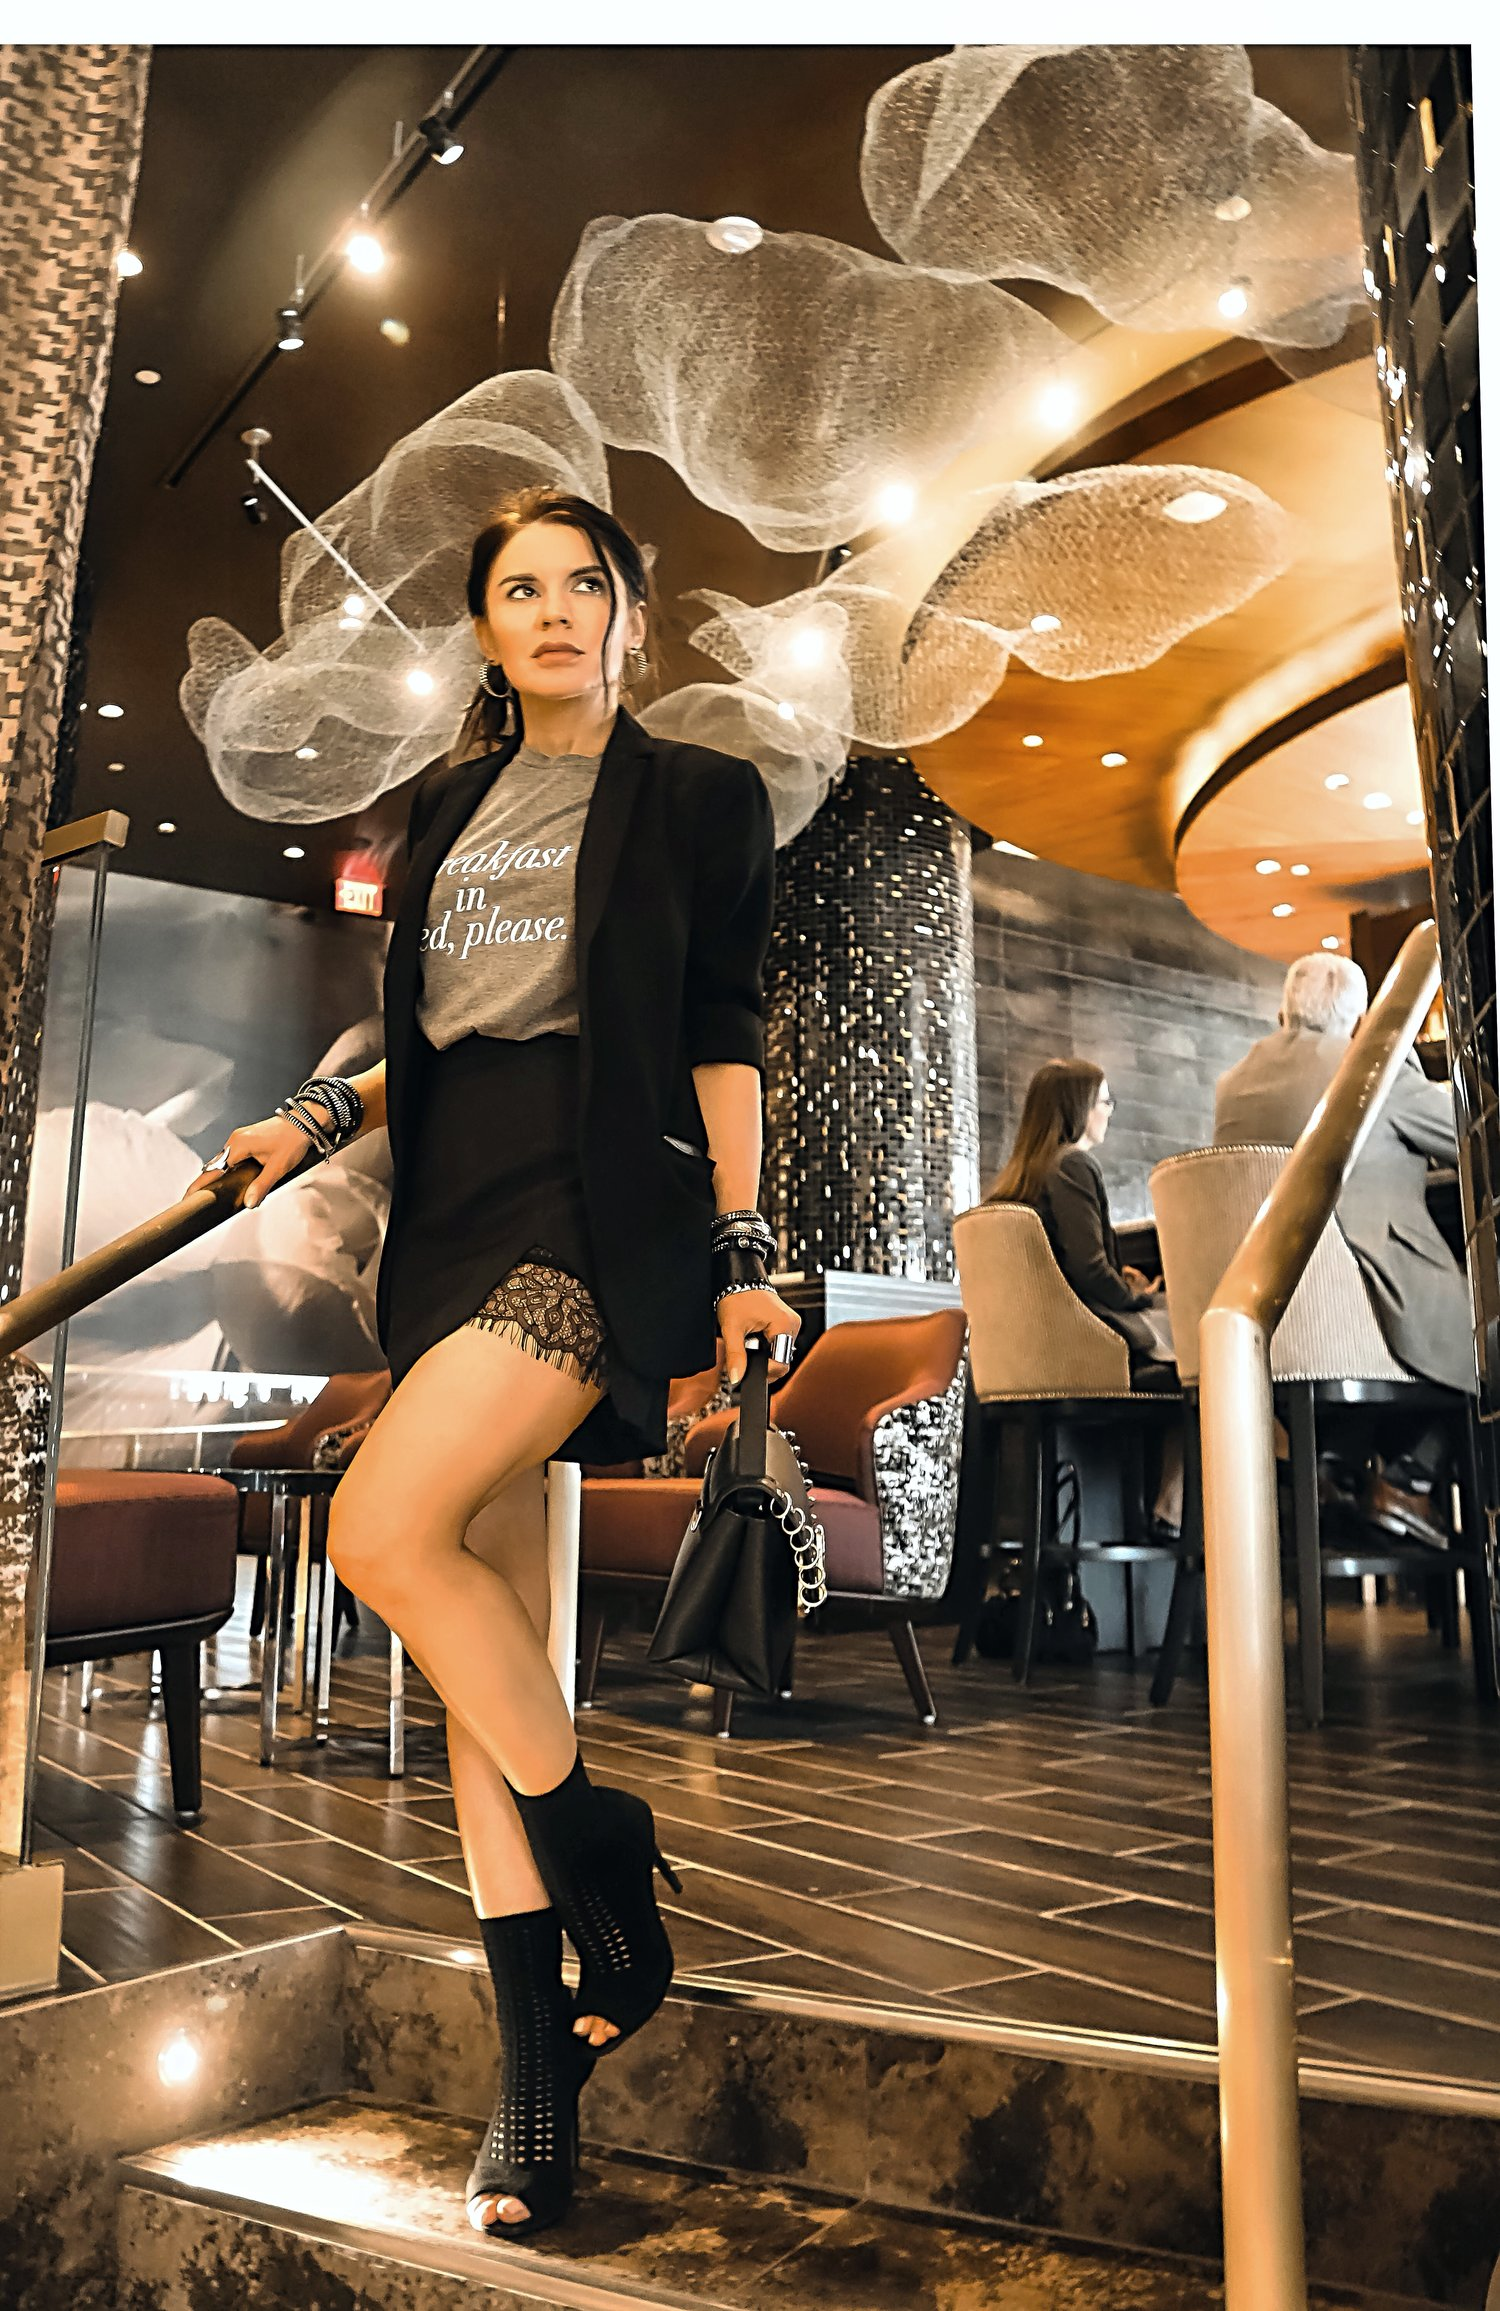 Live Hotel Casino David Restaurant Bar Mesh Cloud Artwork Decor Isabel Alexander